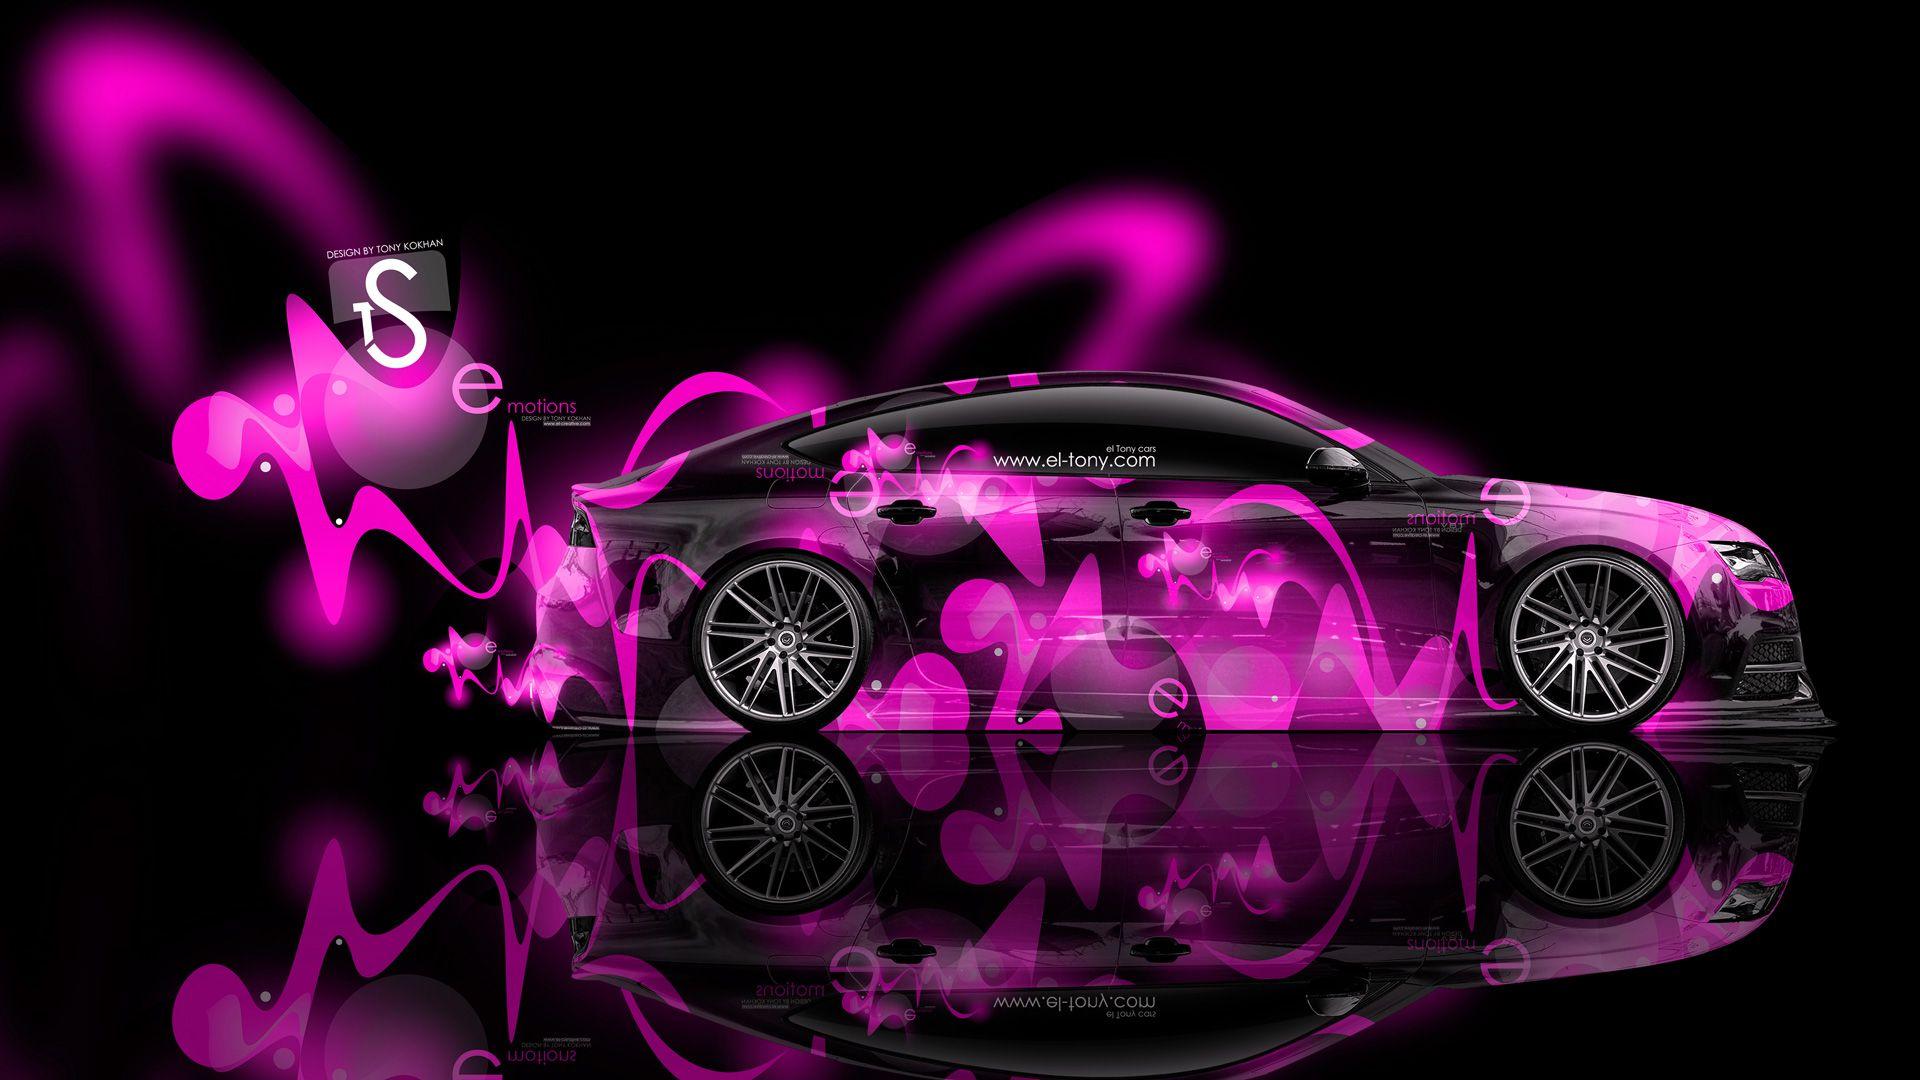 Toyota Supra Plastic Effects Pink 2013 HD Wallpapers Design By Tony Kokhan [www.el Tony.com]  | El Tony.com | Pinterest | Toyota Supra, Toyota And Jdm Tuning